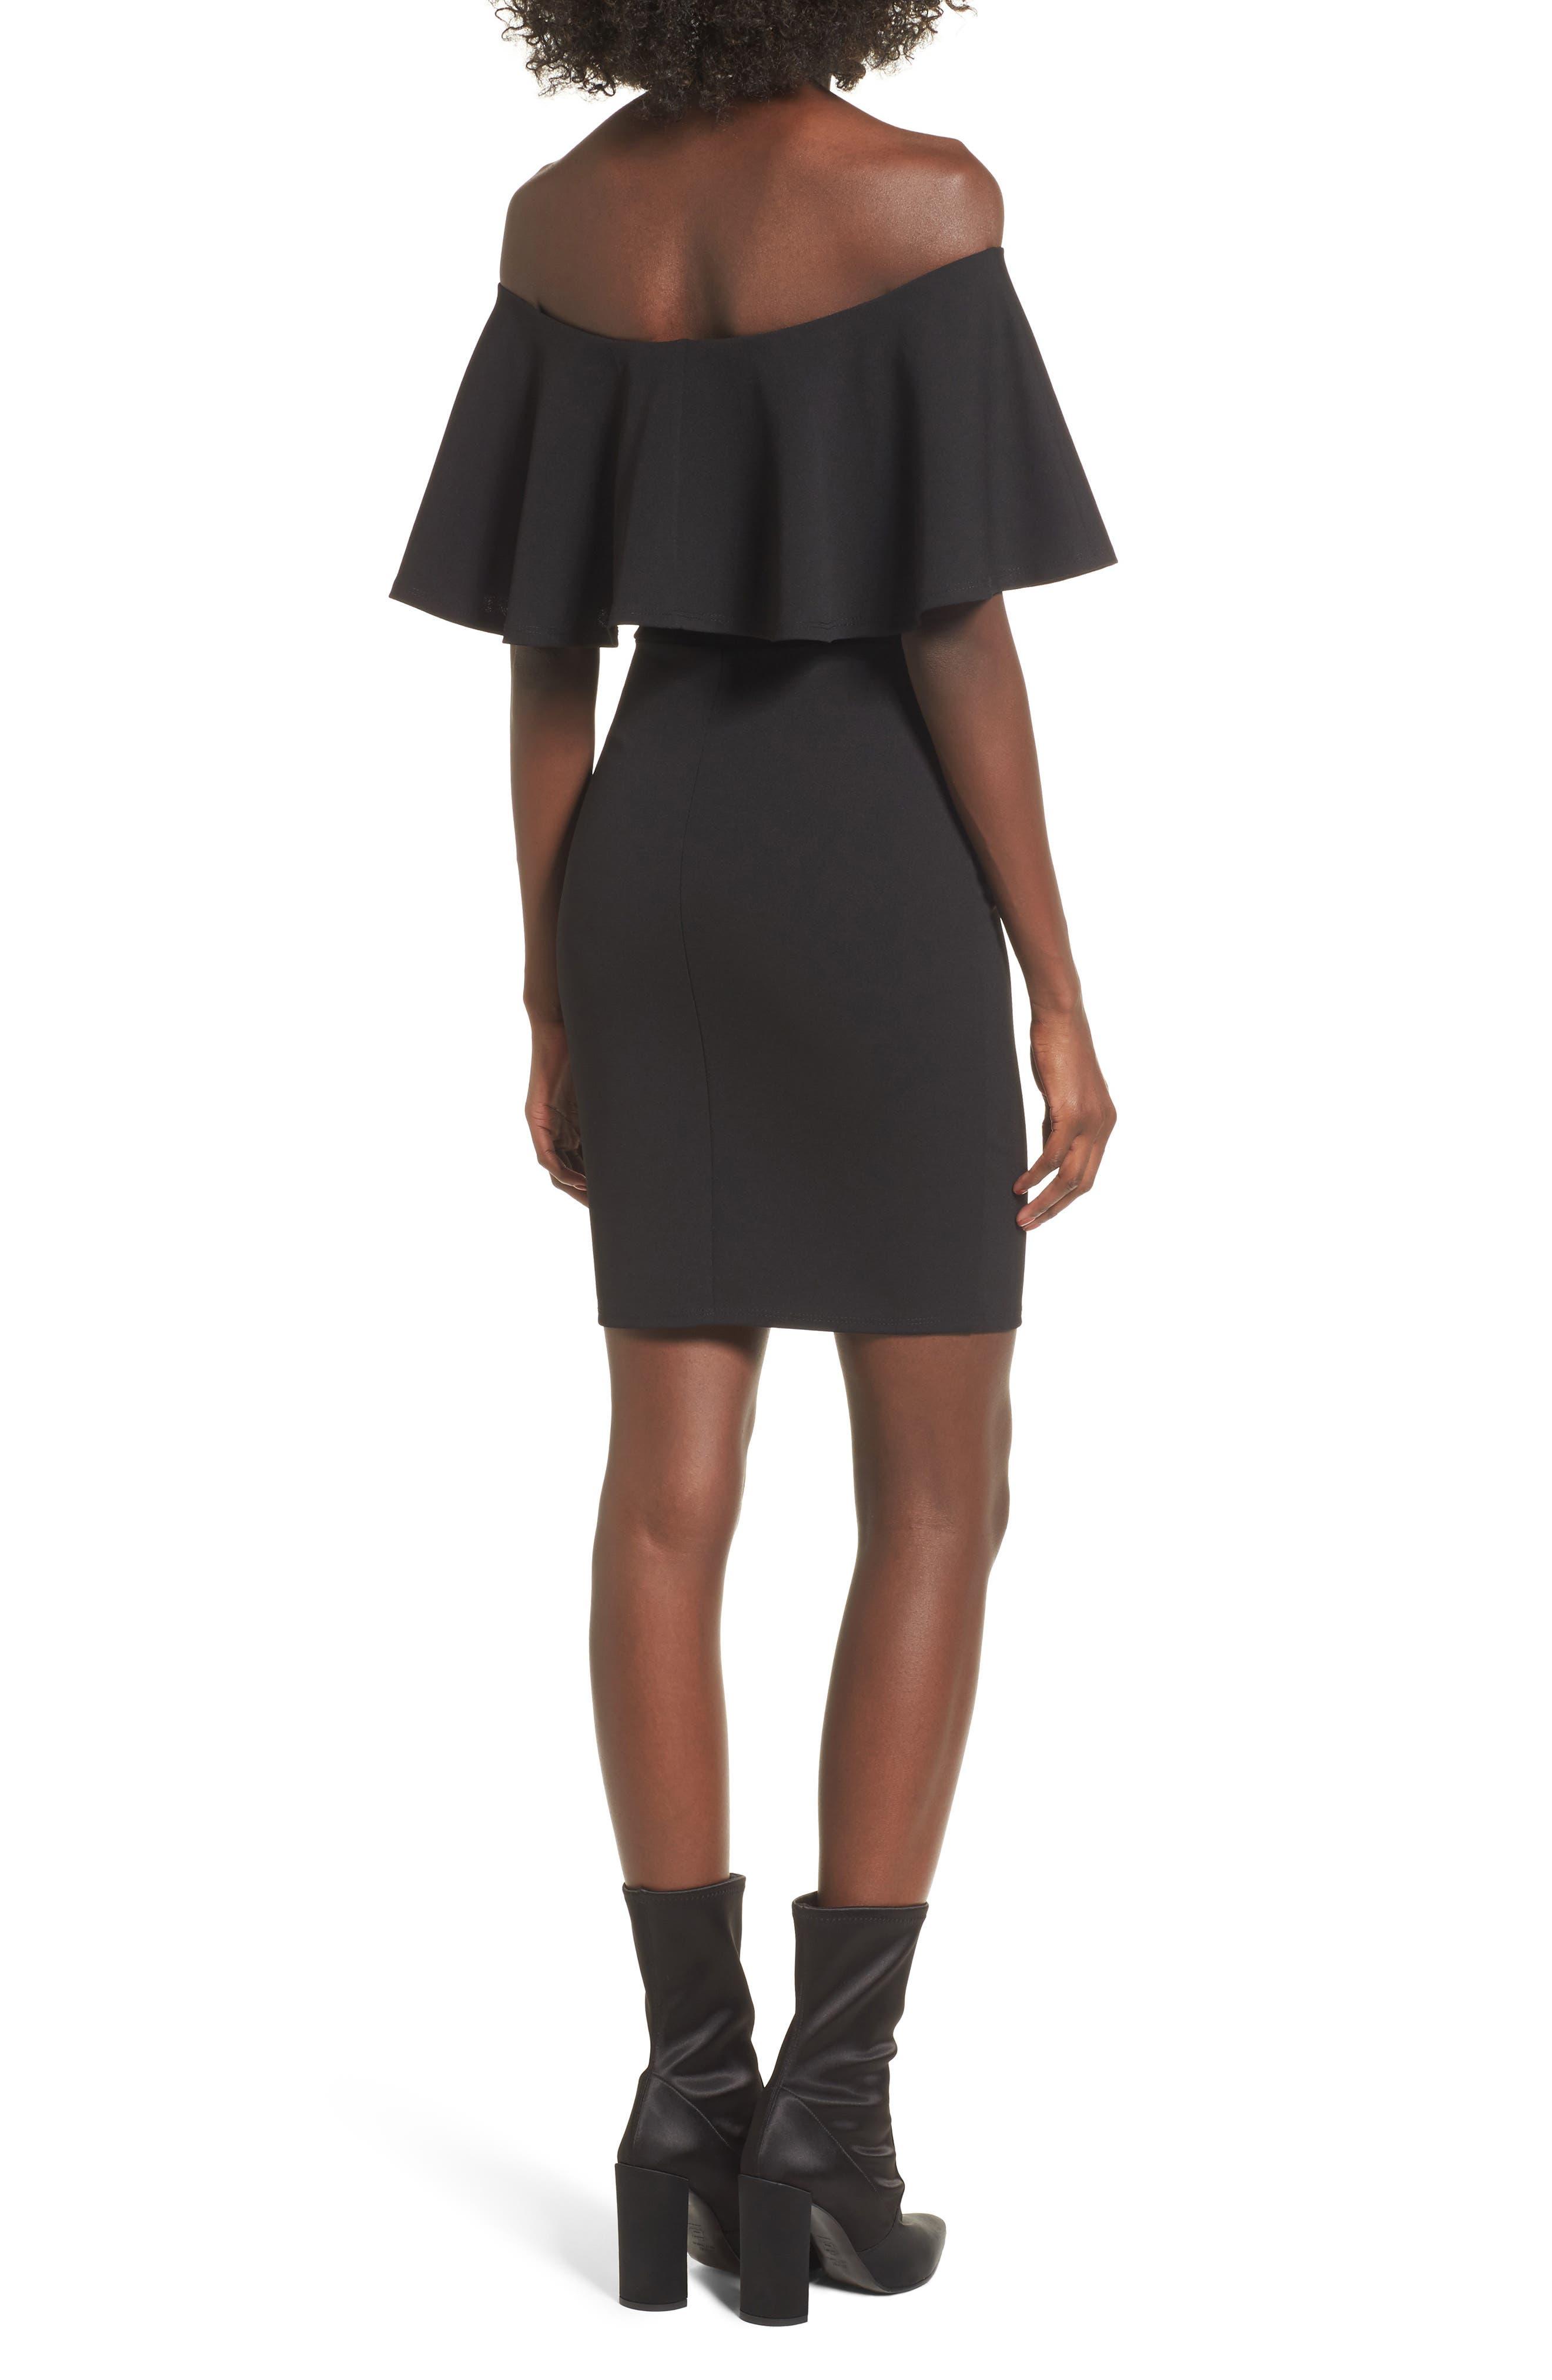 SOPRANO, Ruffle Off the Shoulder Body-Con Dress, Alternate thumbnail 2, color, 001